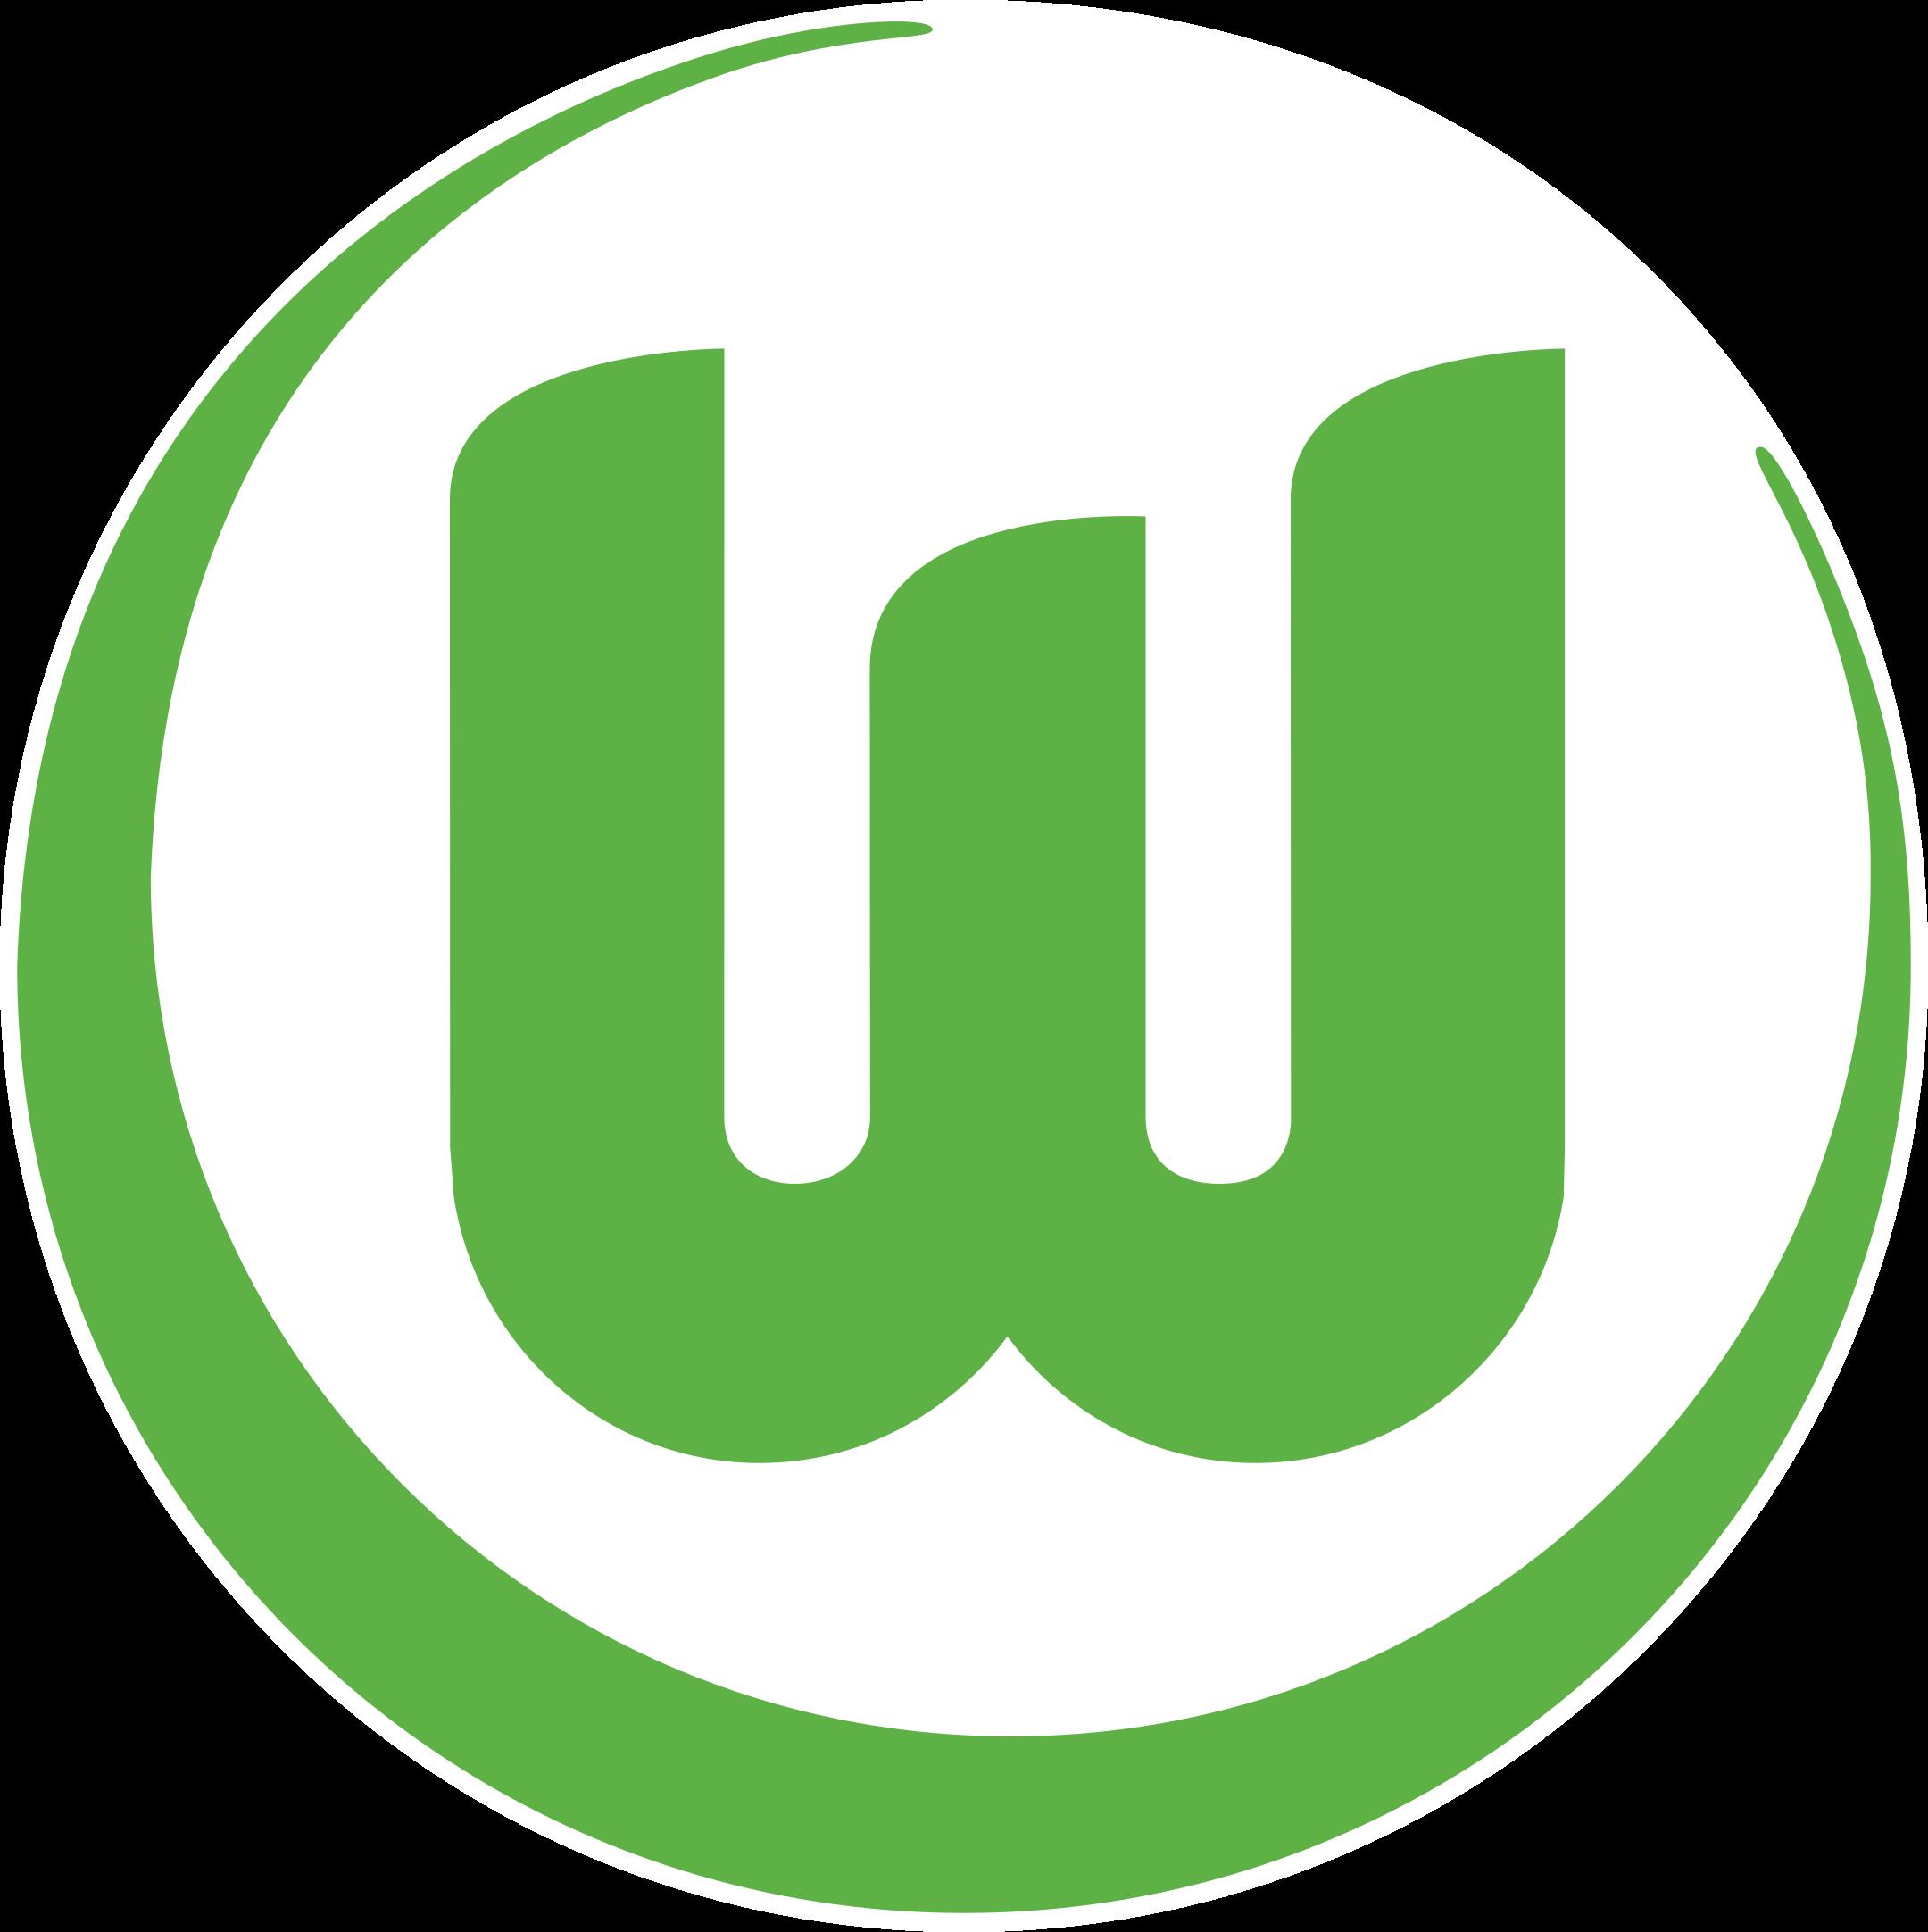 vfl wolfsburg logo 1 - Wolfsburg Logo